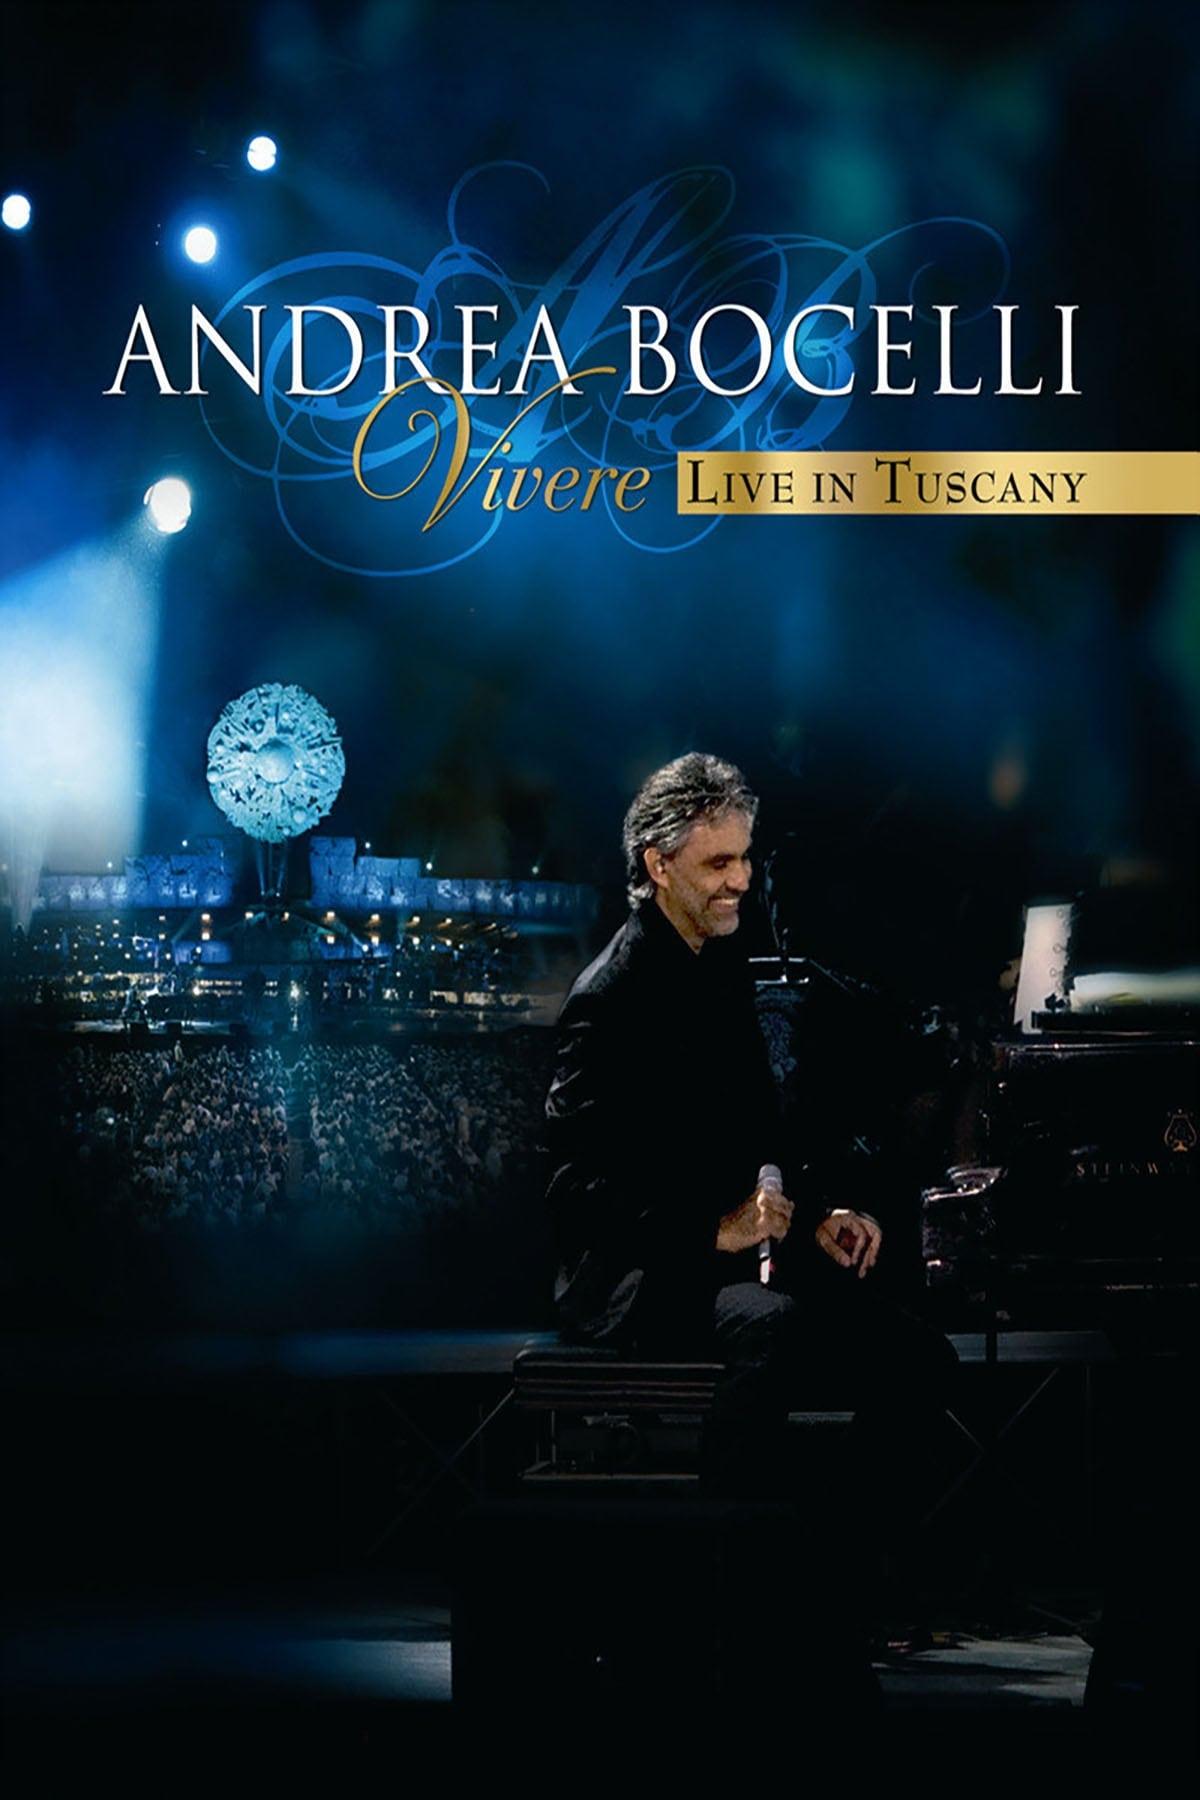 Andrea Bocelli: Vivere Live in Tuscany (2009)